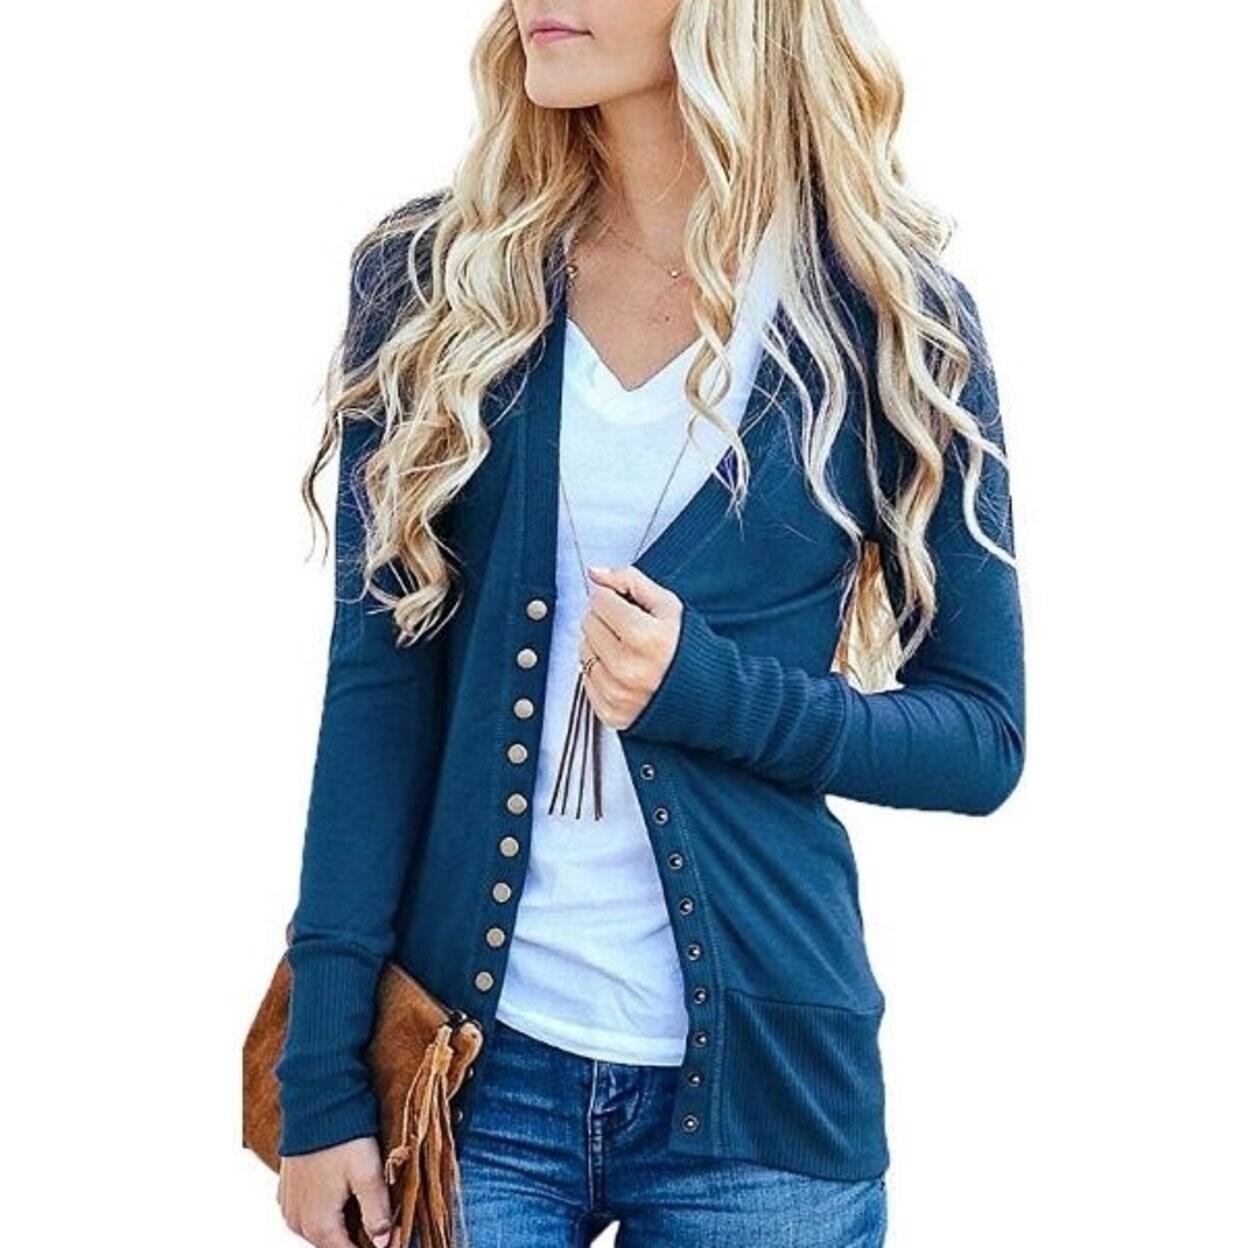 bce818734a6d Shop Women S Cardigan Sweater V-Neck Button Down Knitwear Long ...